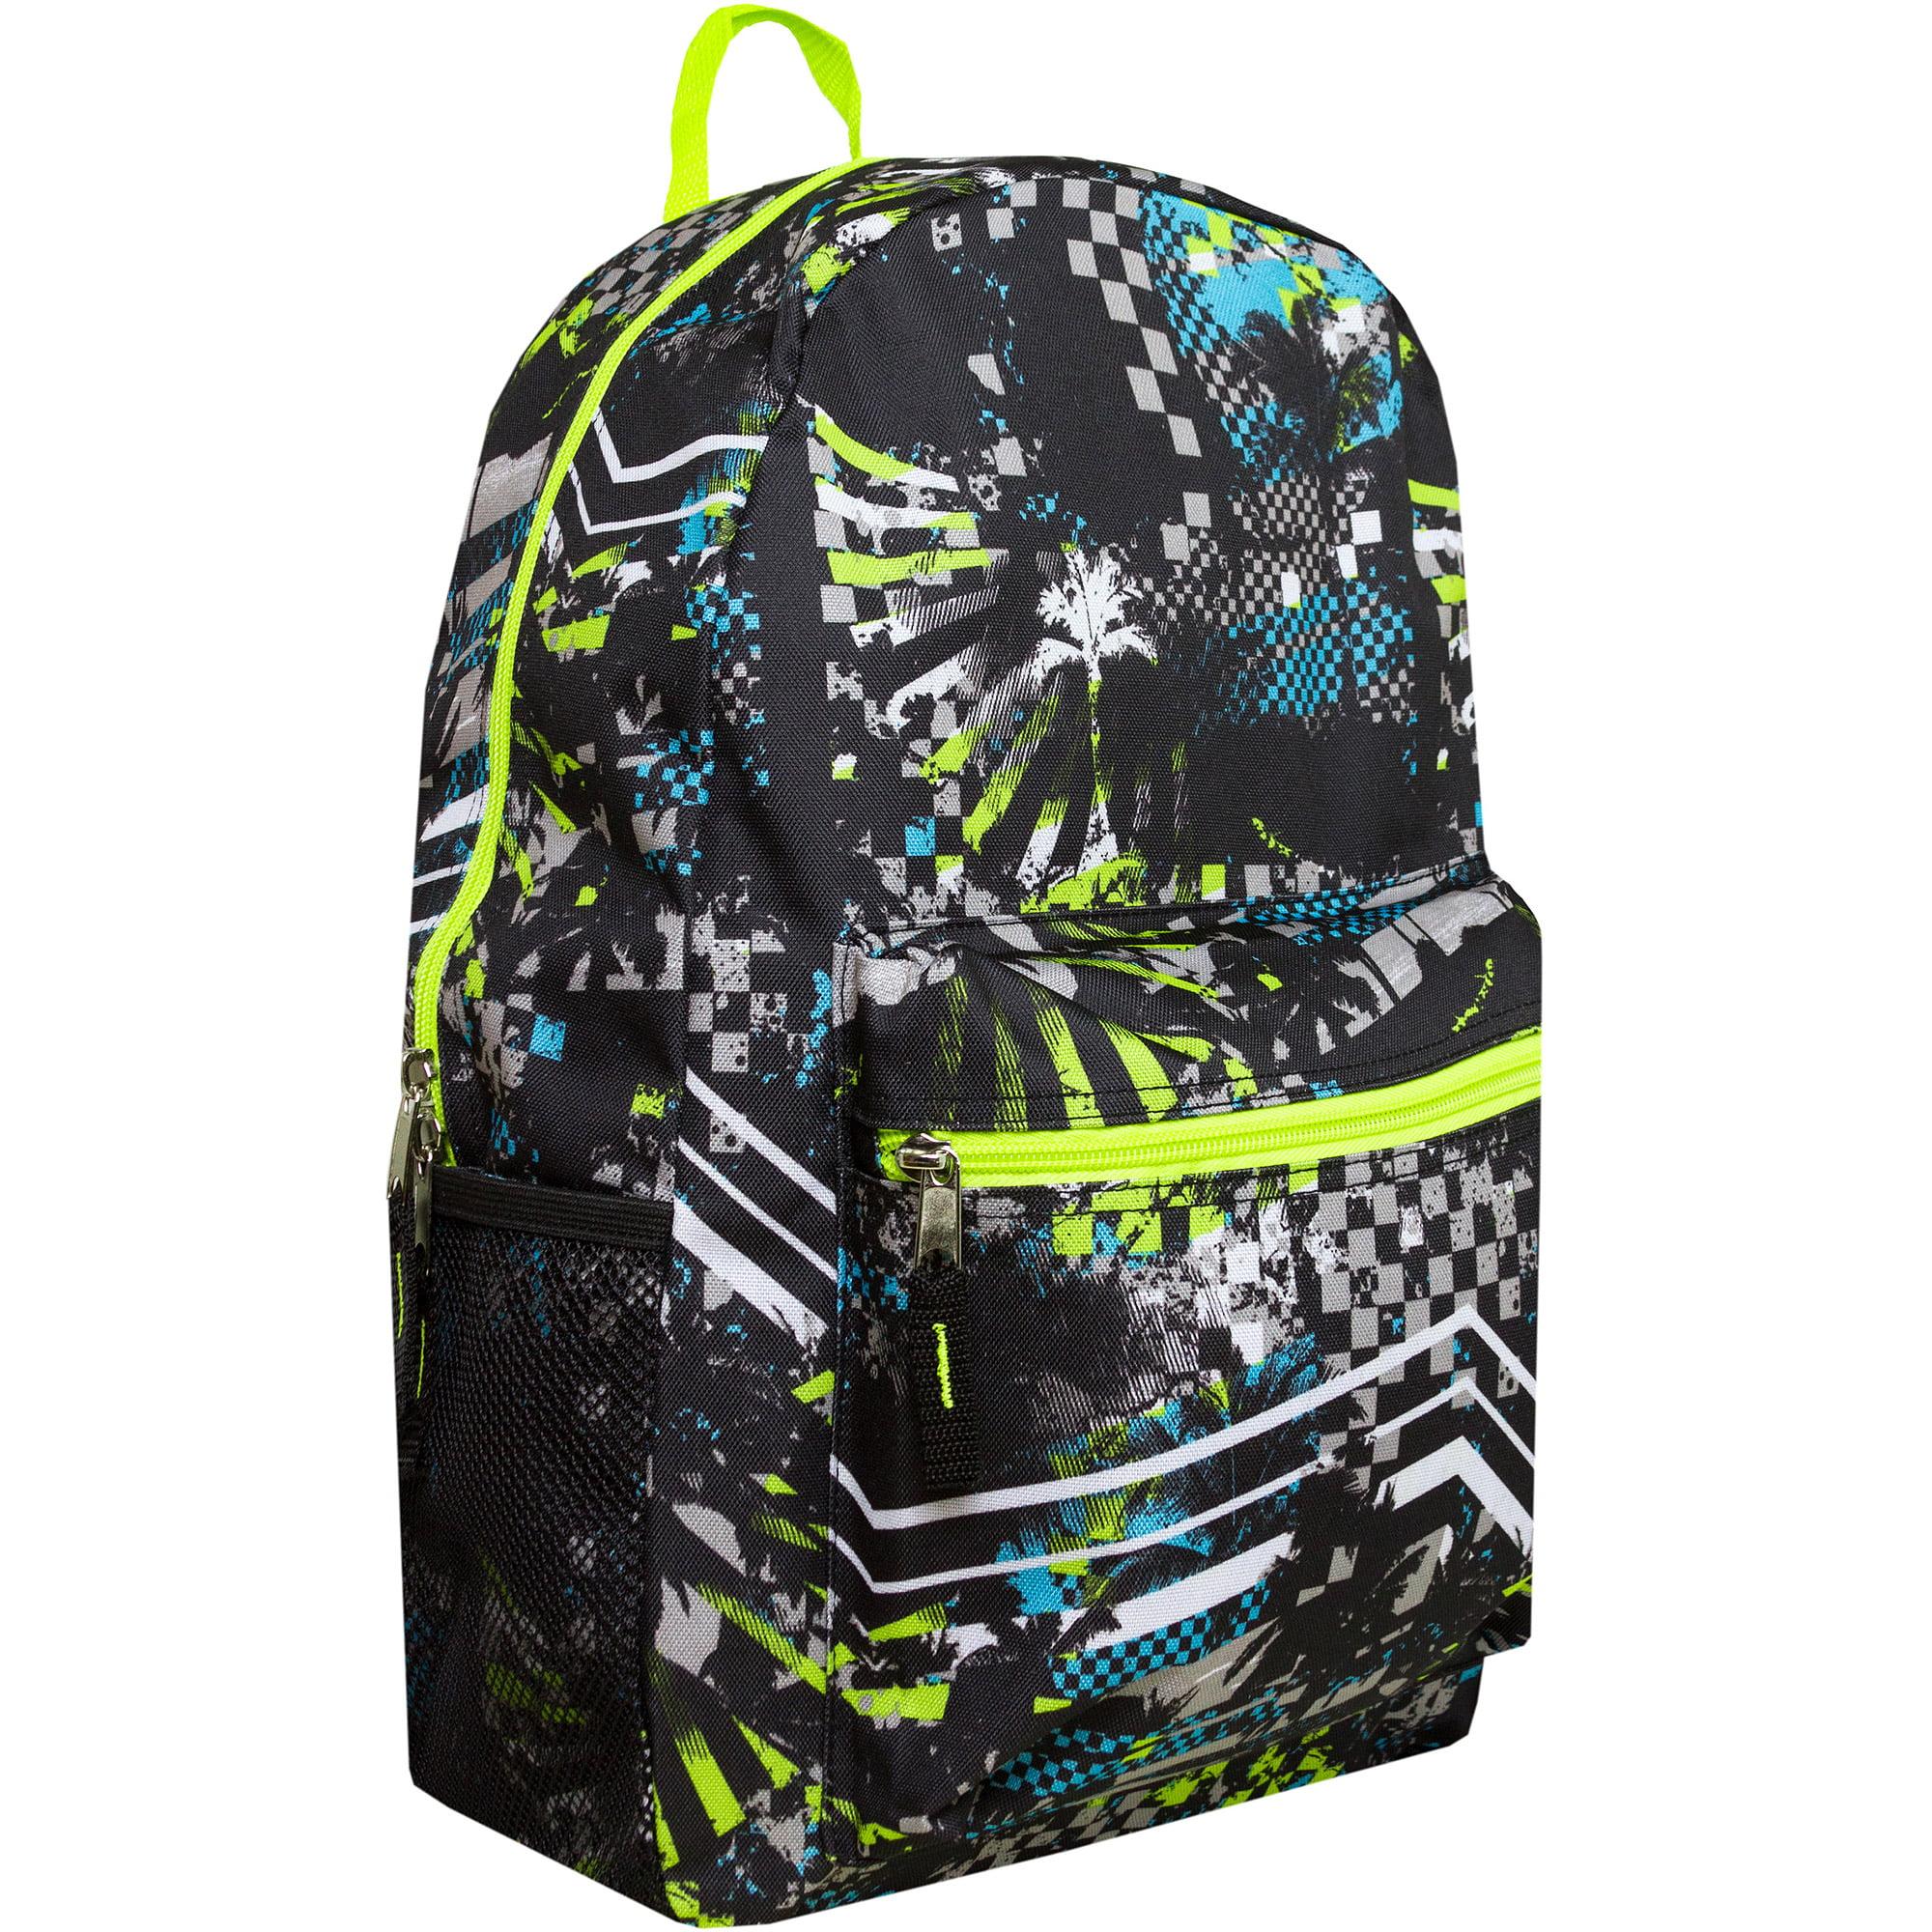 "Pacific Coast Print 17"" Backpack"